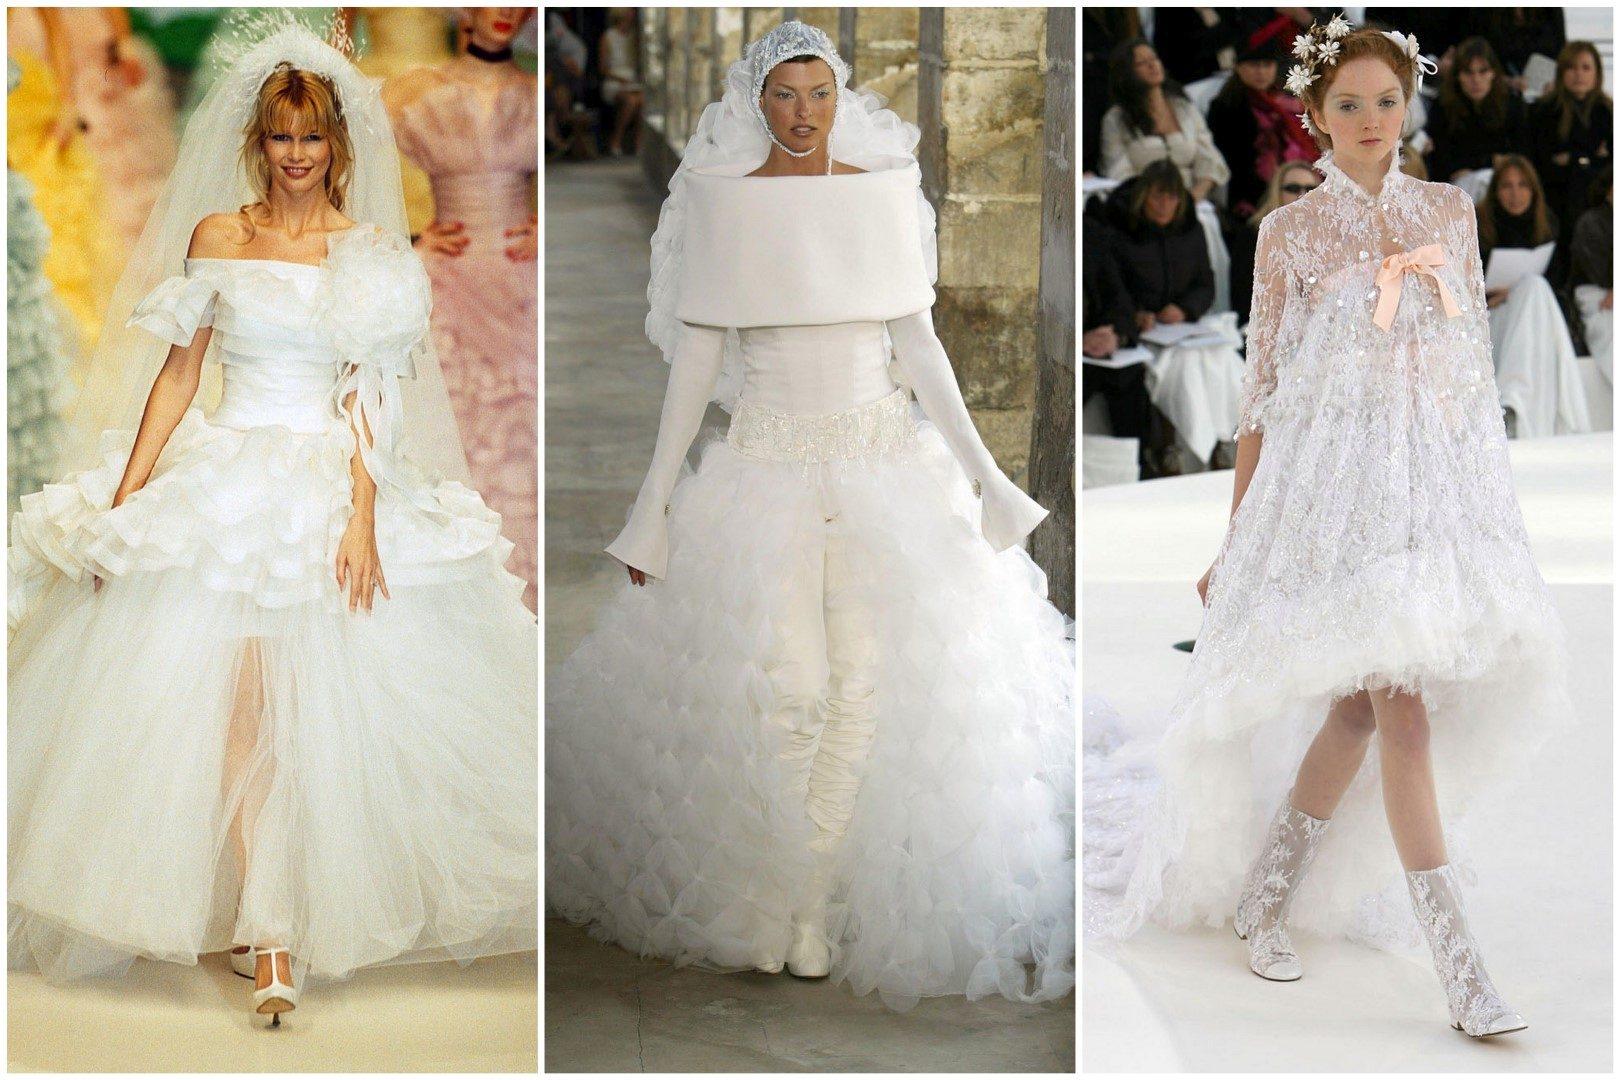 ,chanel,esküvői ruha,haute couture,haute couture esküvői ruha,esküvő,divattervező,lagerfeld,claudia schiffer,